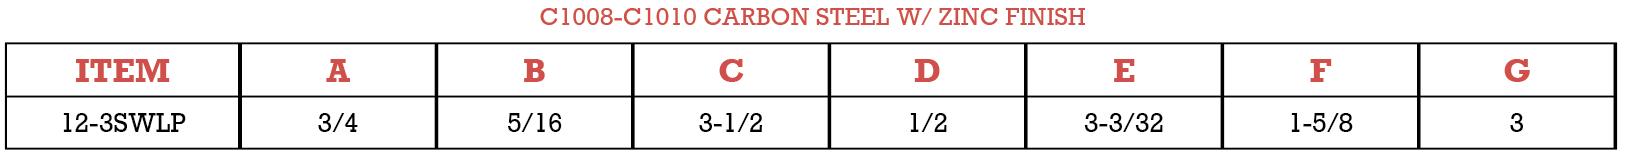 single wire lock pin-carobon stainless steel